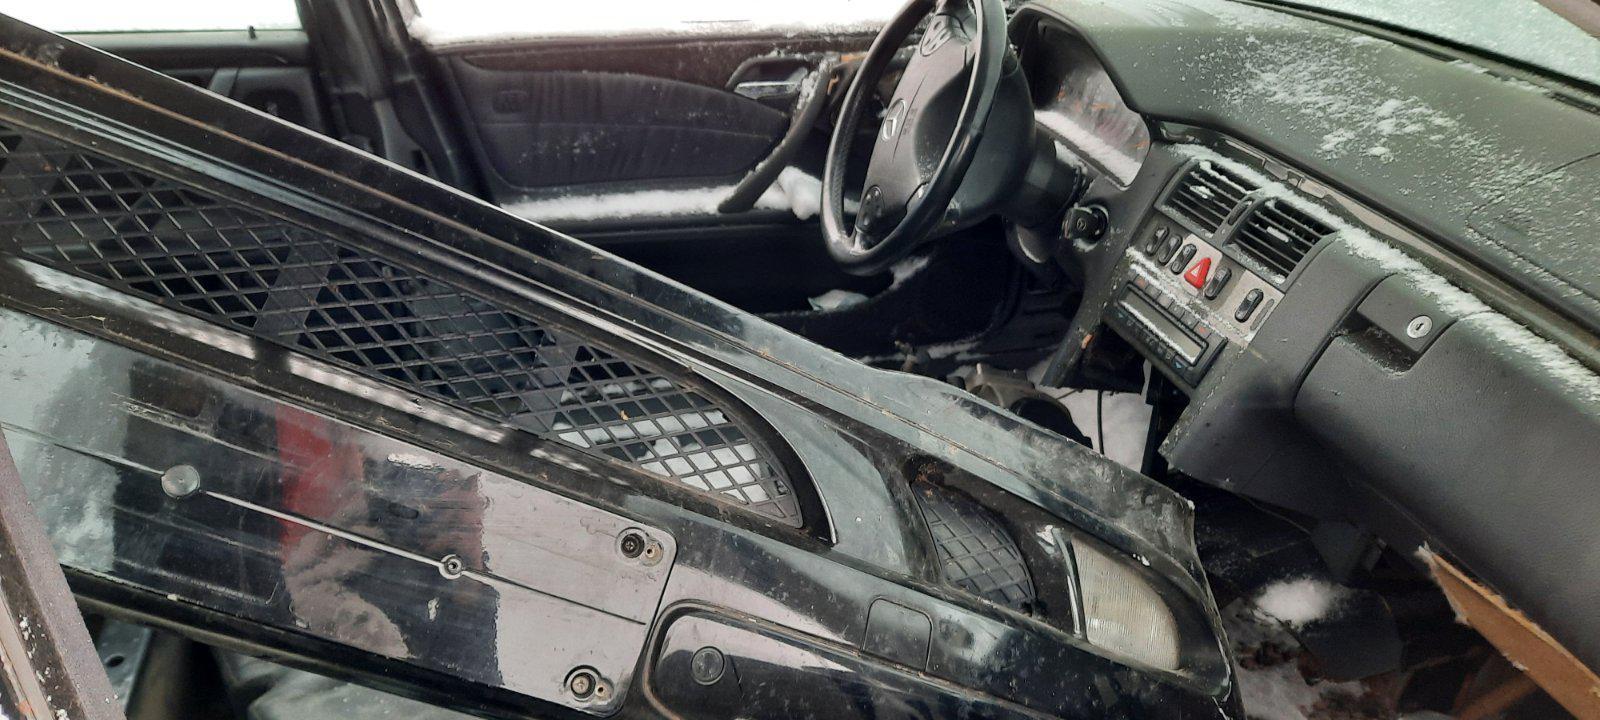 Used Car Parts Foto 3 Mercedes-Benz E-CLASS 2000 0.0 Mechanical Universal 4/5 d. Black 2021-1-12 A6026